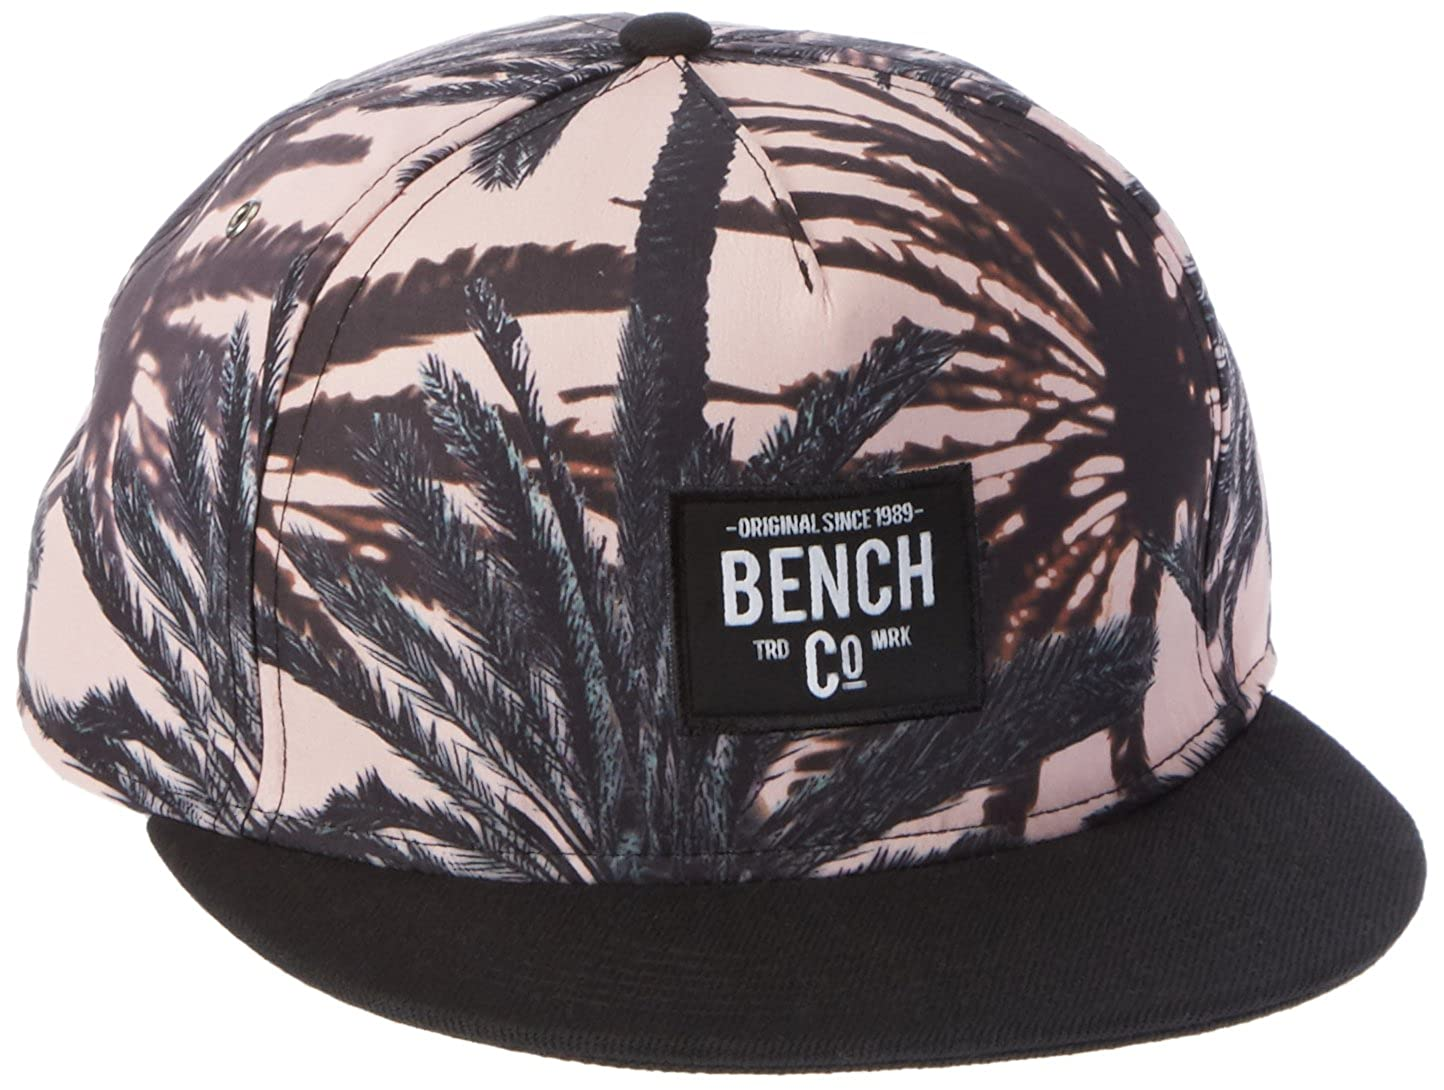 Bench Cappellino Palmbeach Snapback cap Basecap Snapback cap